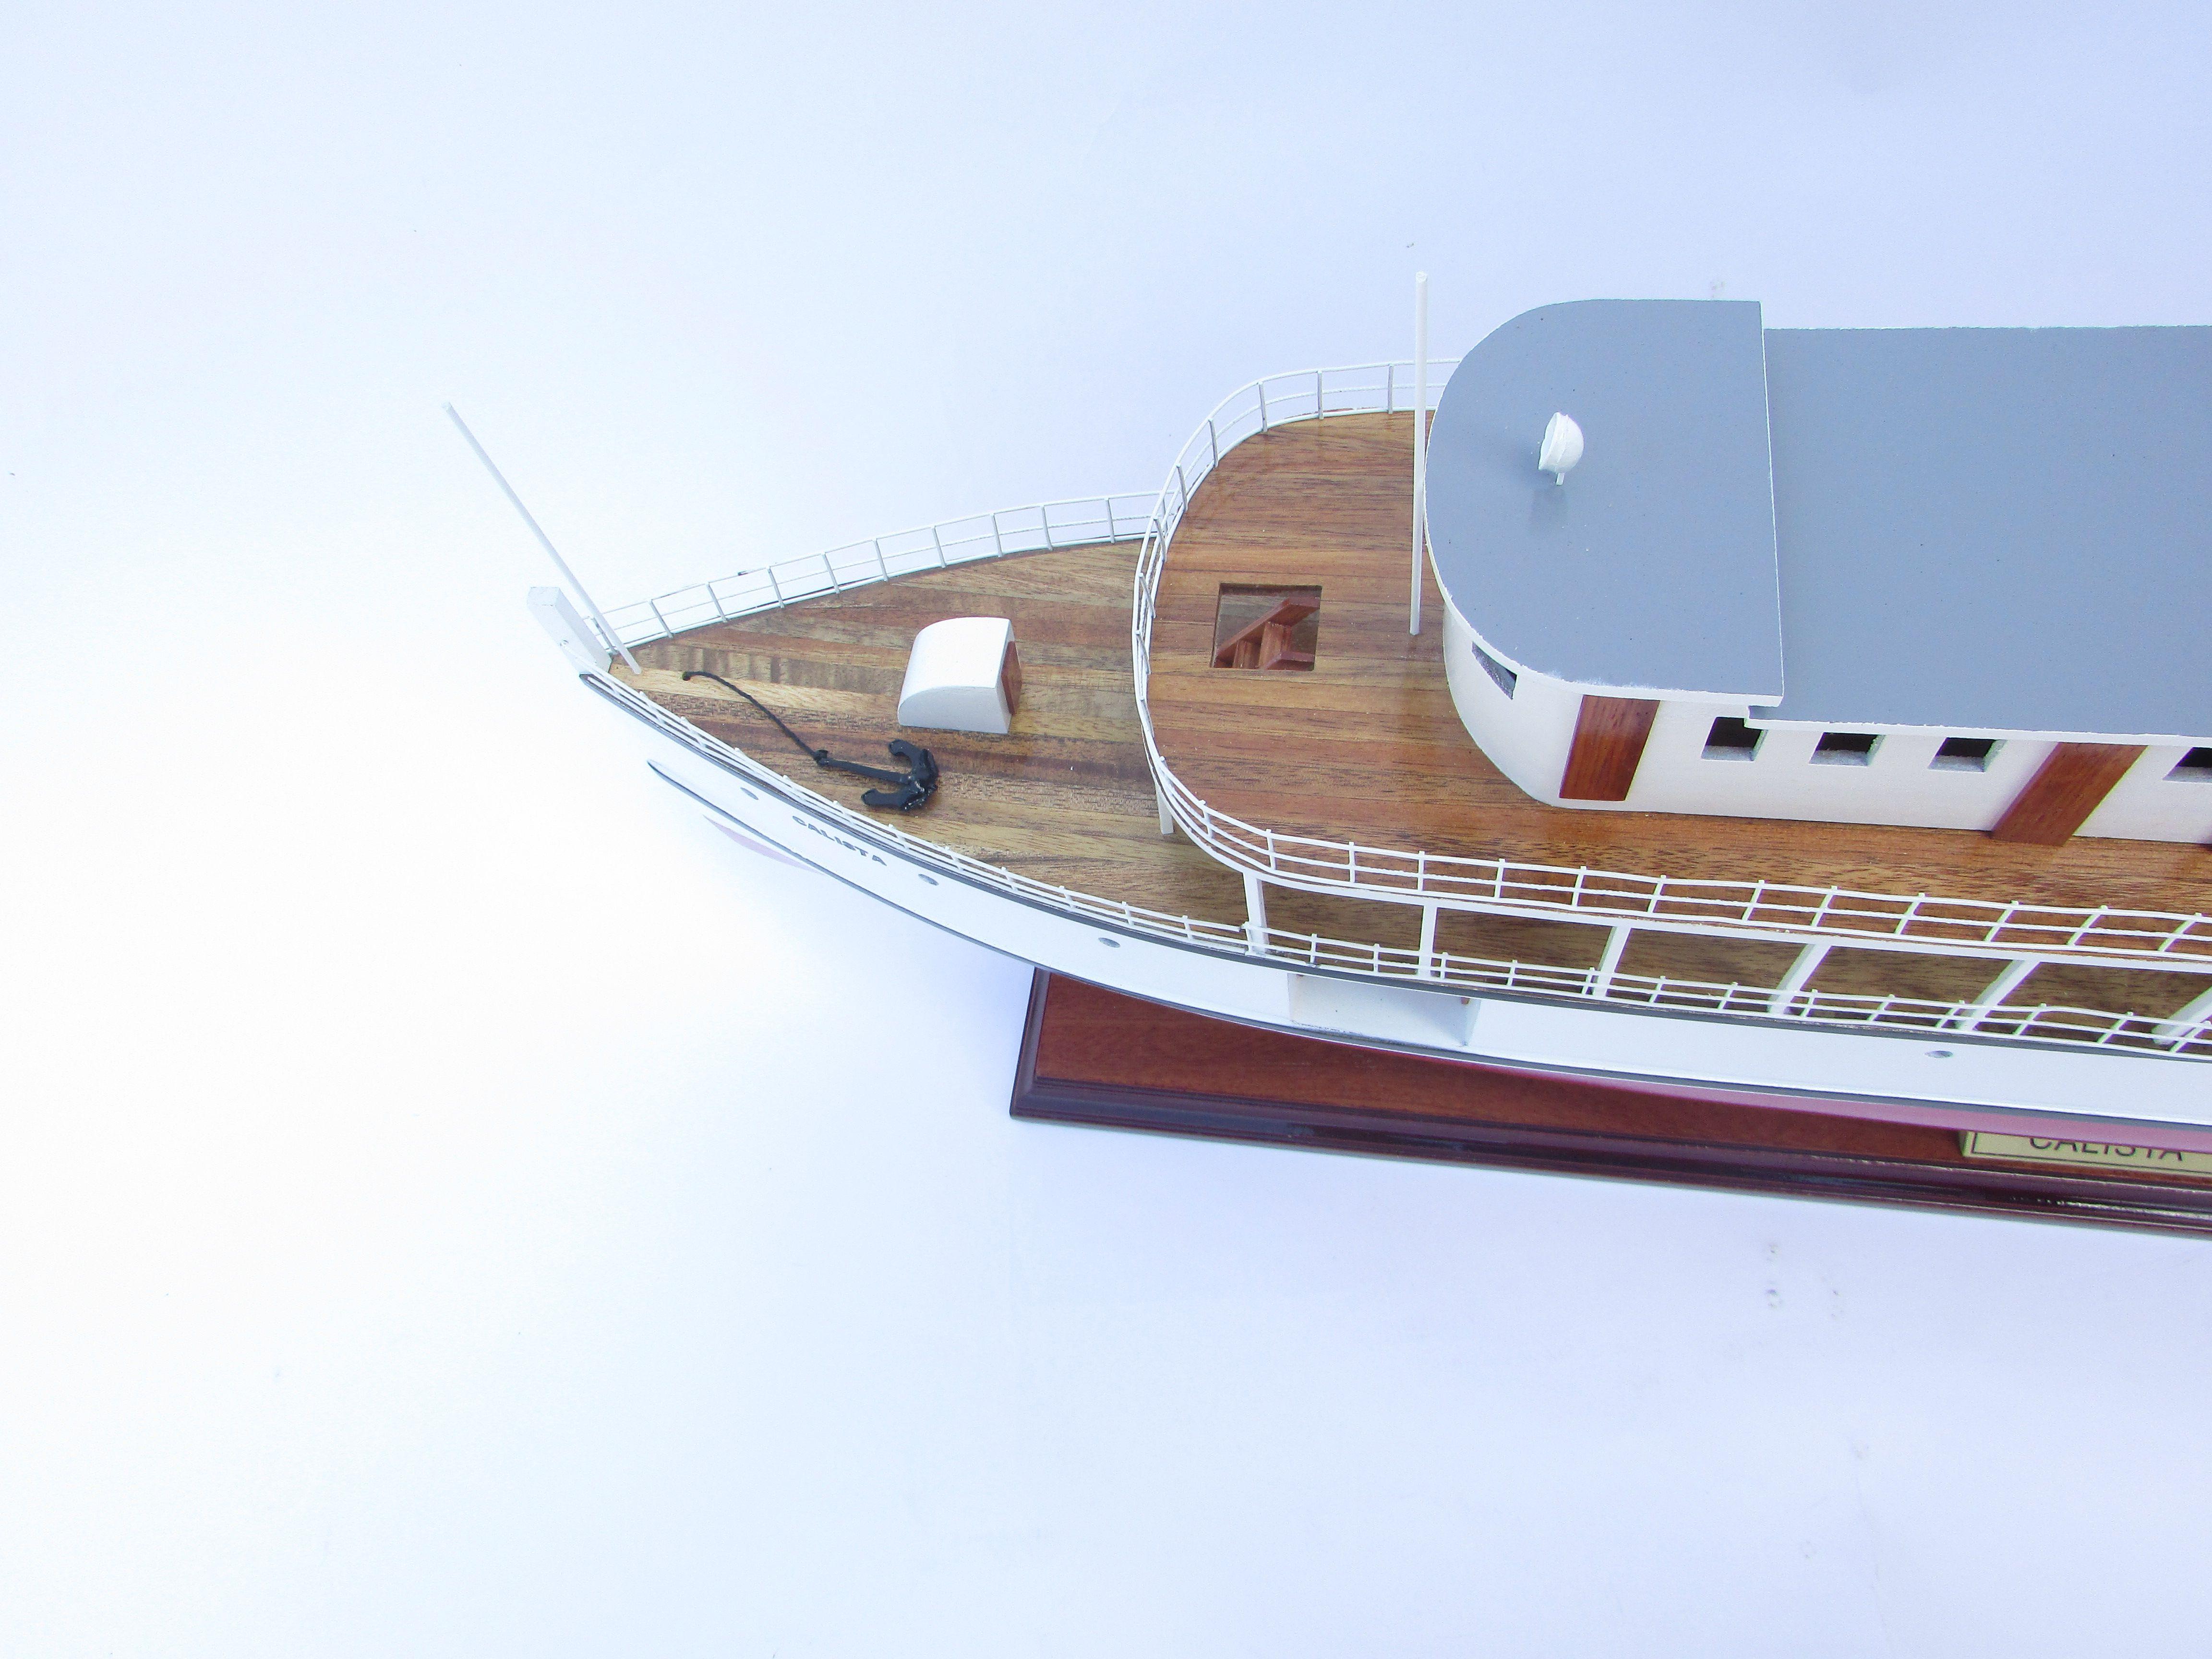 Maquette de bateau Calista - GN (CS0151P)